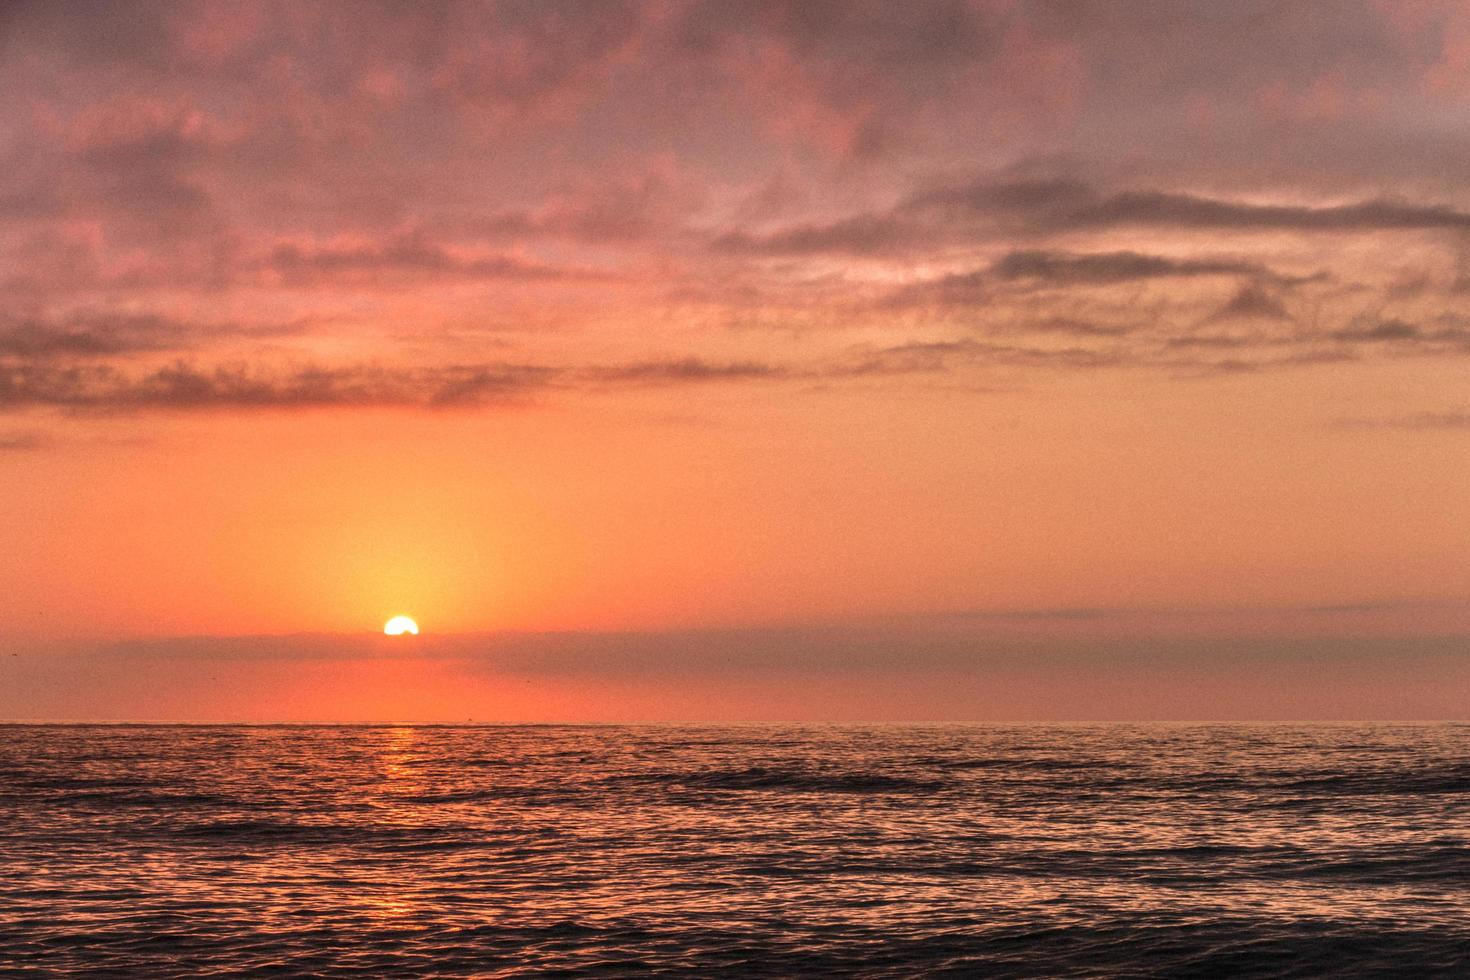 Dramatic ocean sunset photo